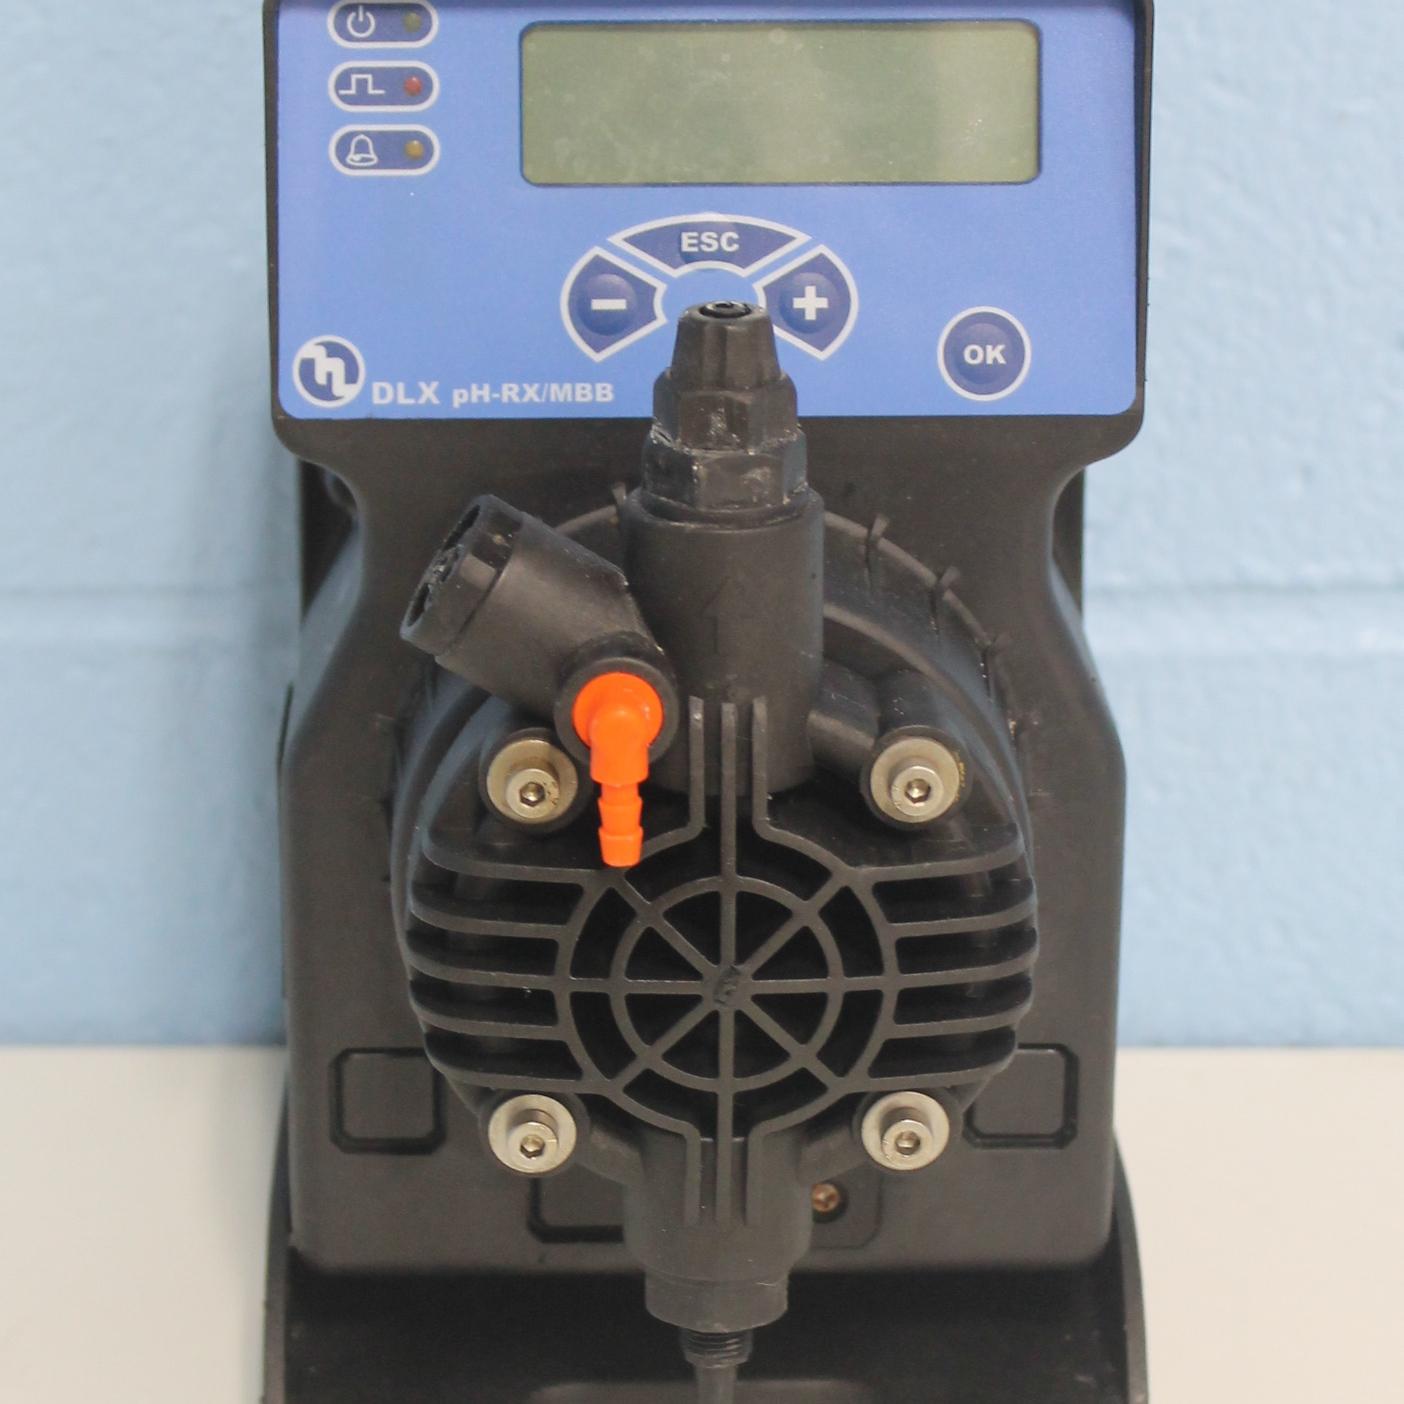 Etatron DLX pH-RX/MBB Electromagnetic Dosing Pump P/N PBX3622201 Image